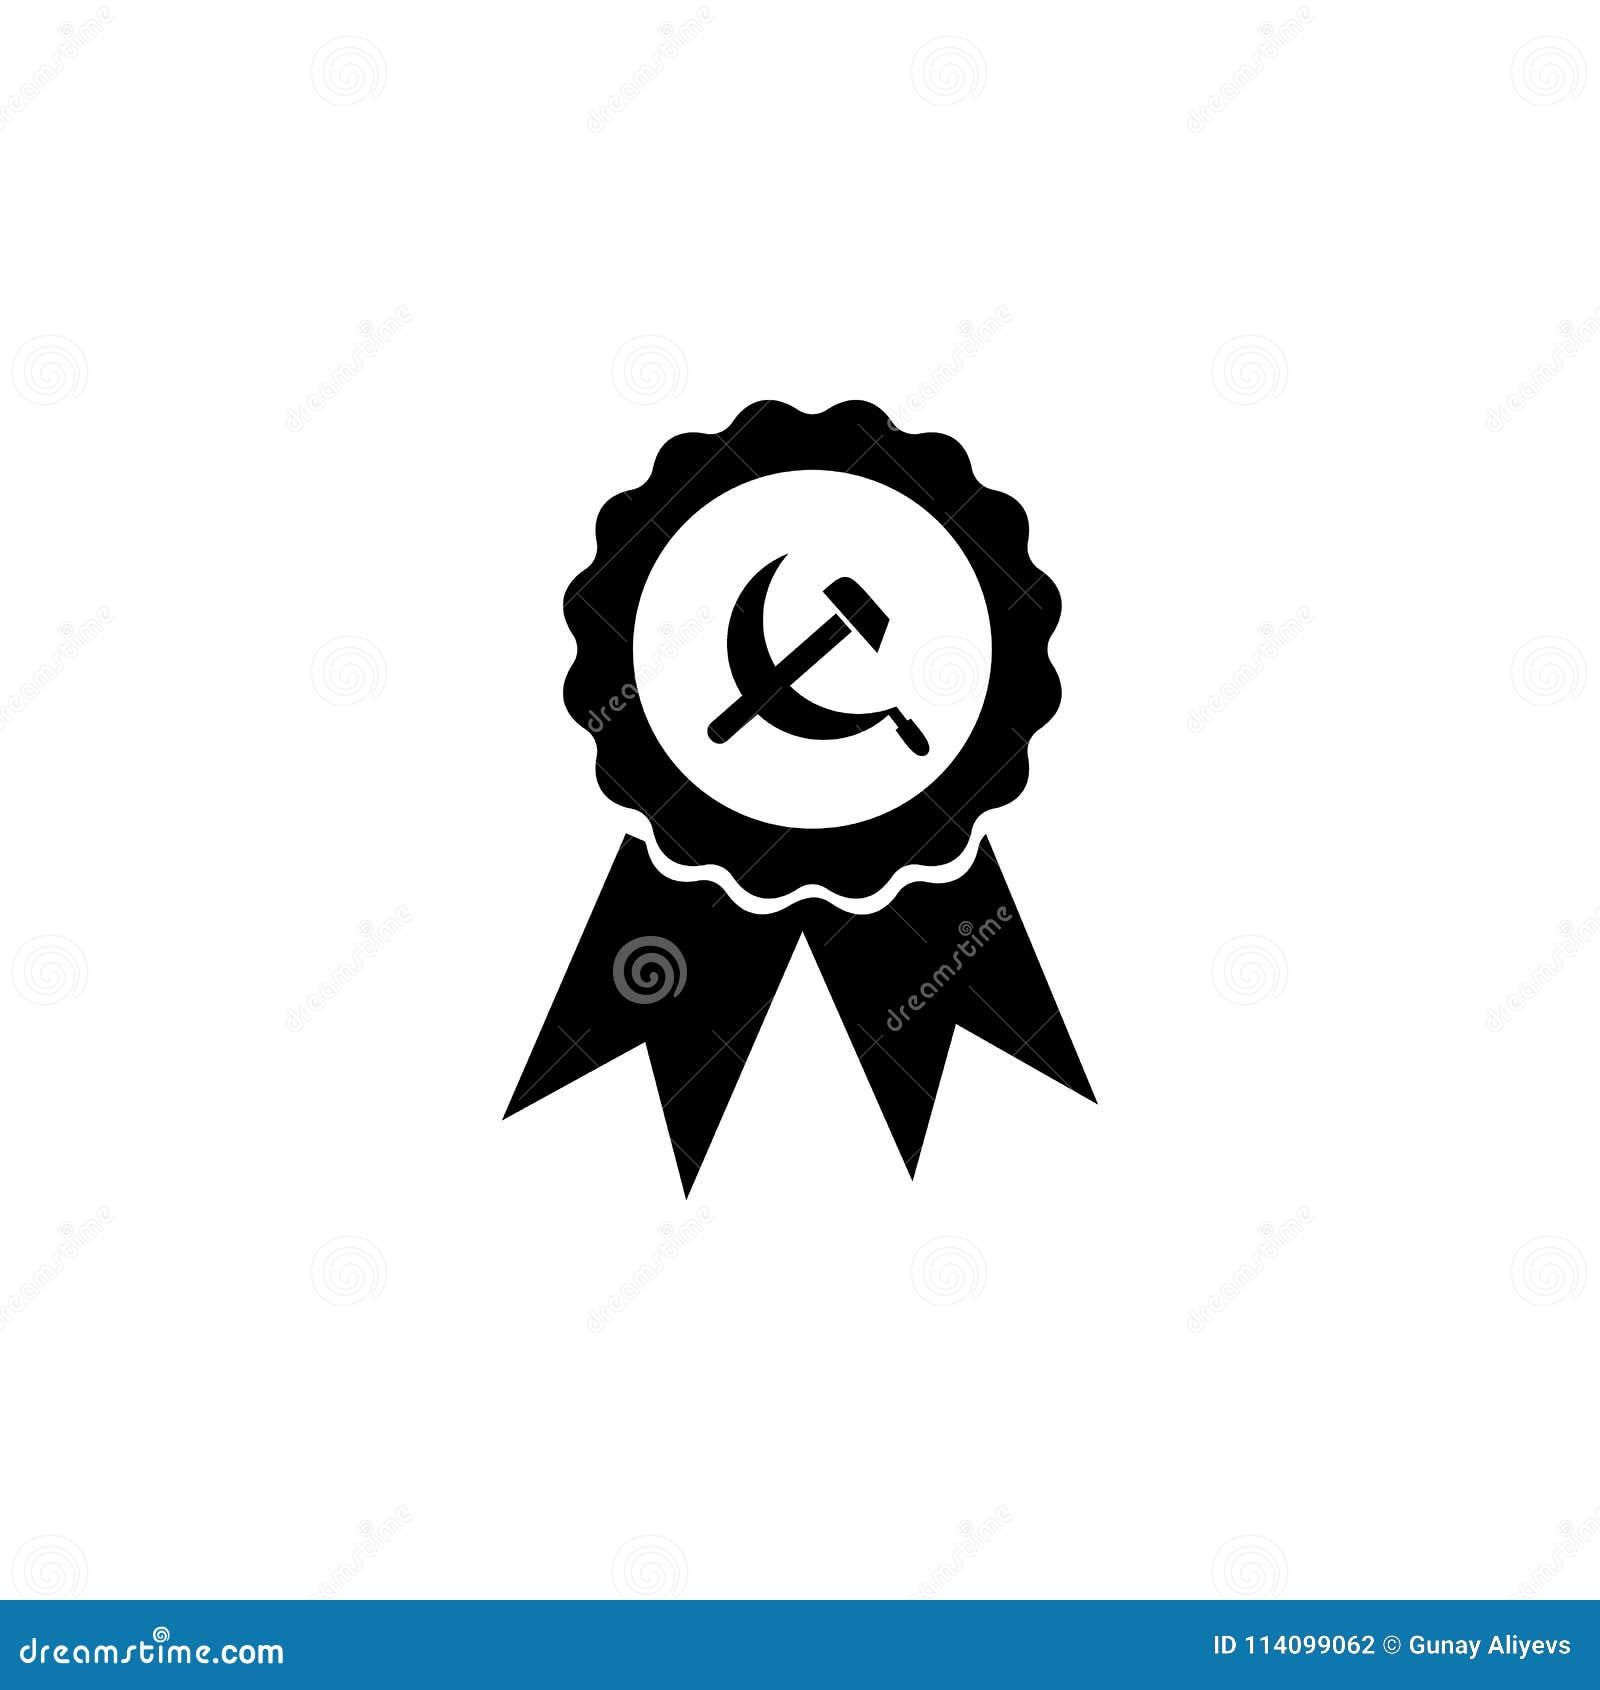 Hammer And Sickle Medal Icon Element Of Communism Illustration